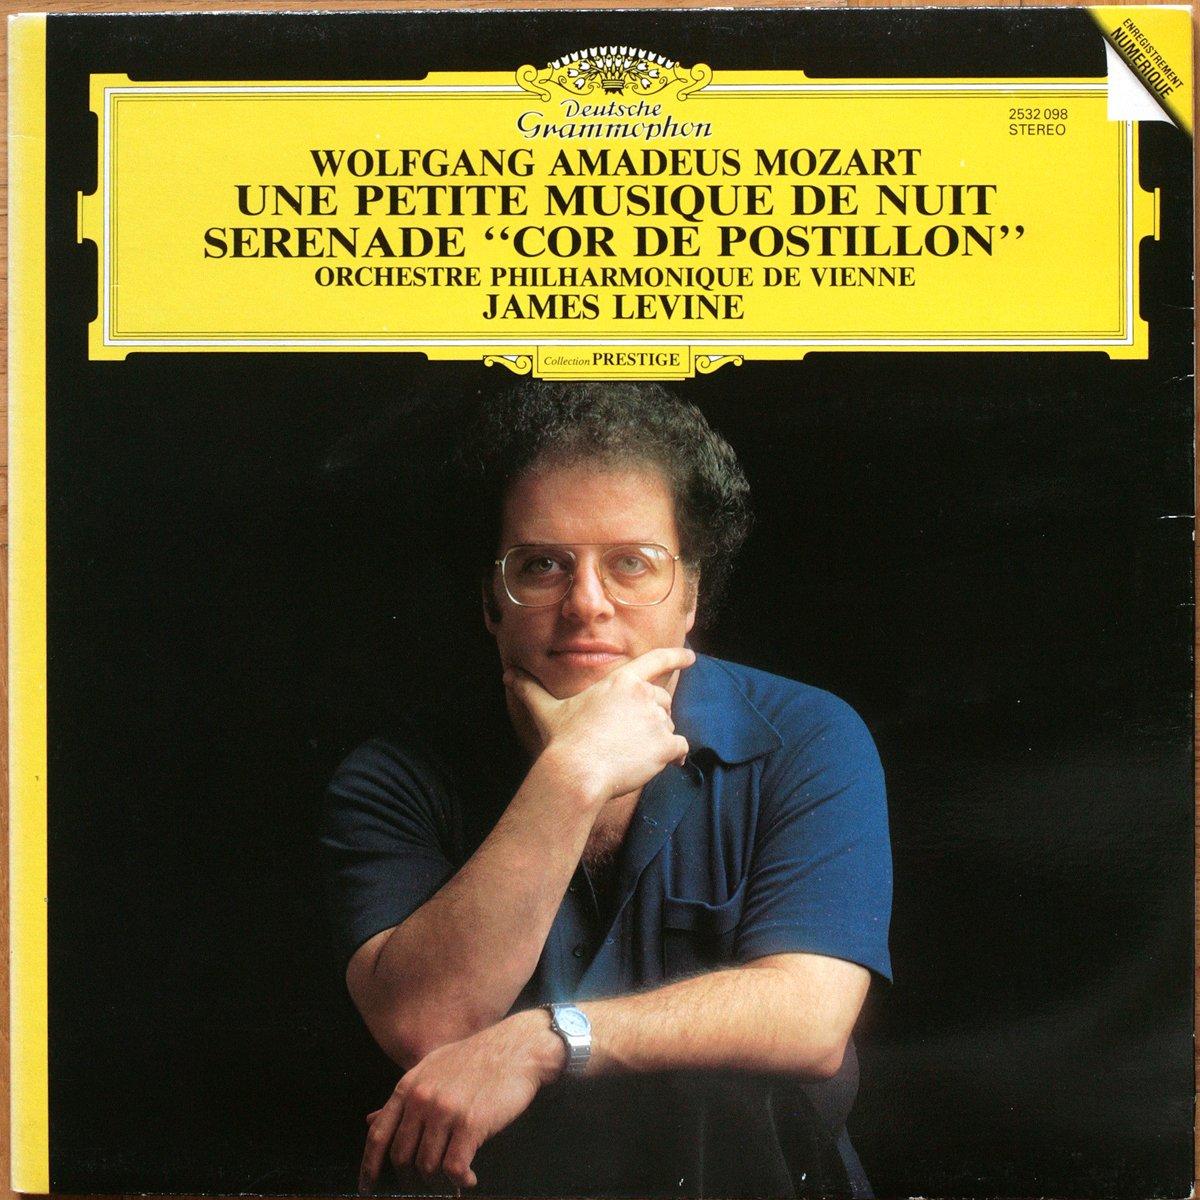 DGG 2532098 Mozart Serenade Levine